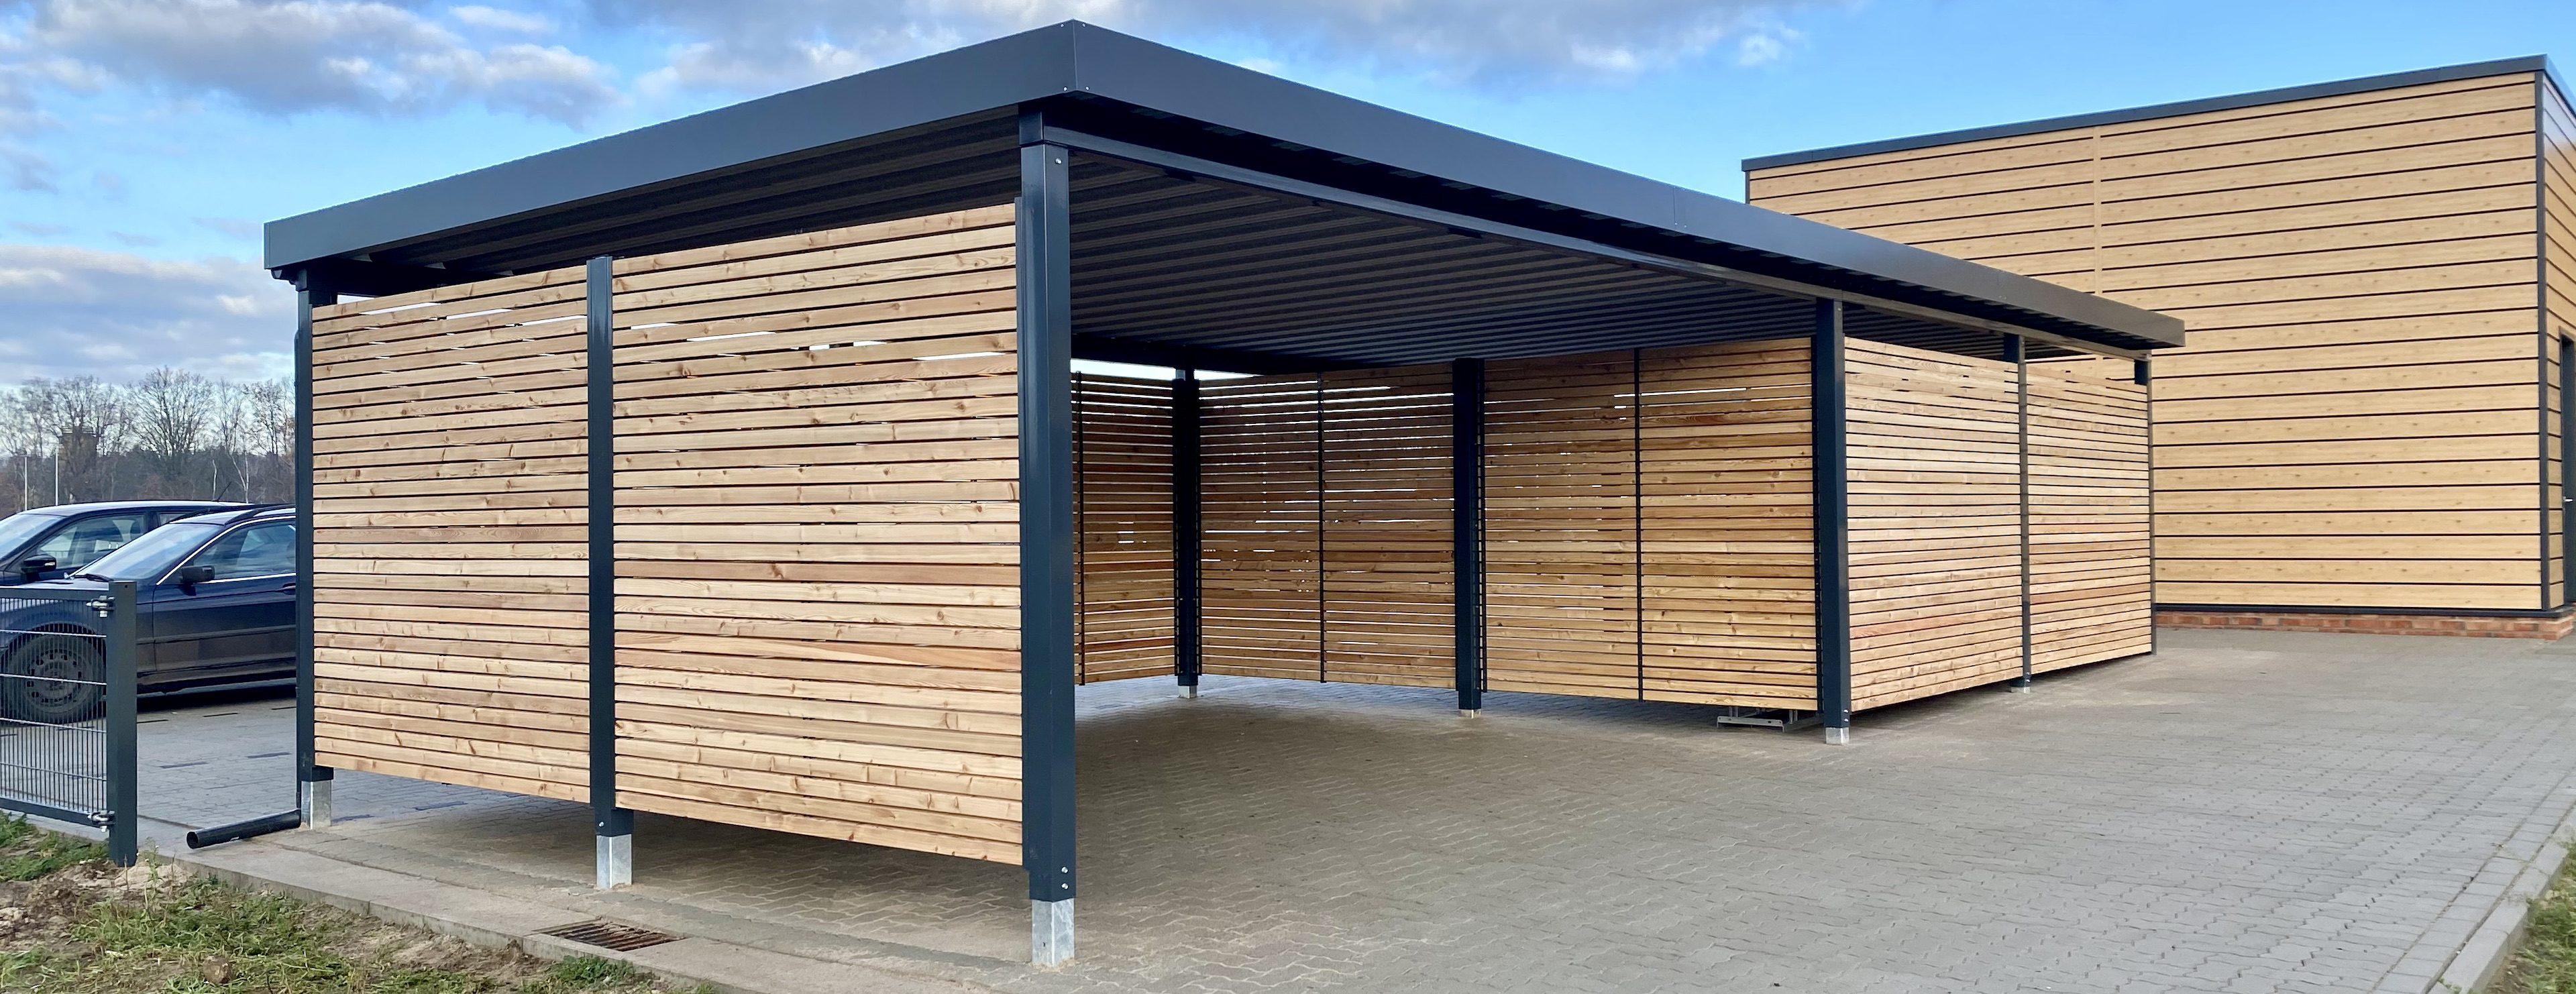 Lieken Metall Design – Carports, Mülltonnenboxen und mehr – Kubus Design Carport